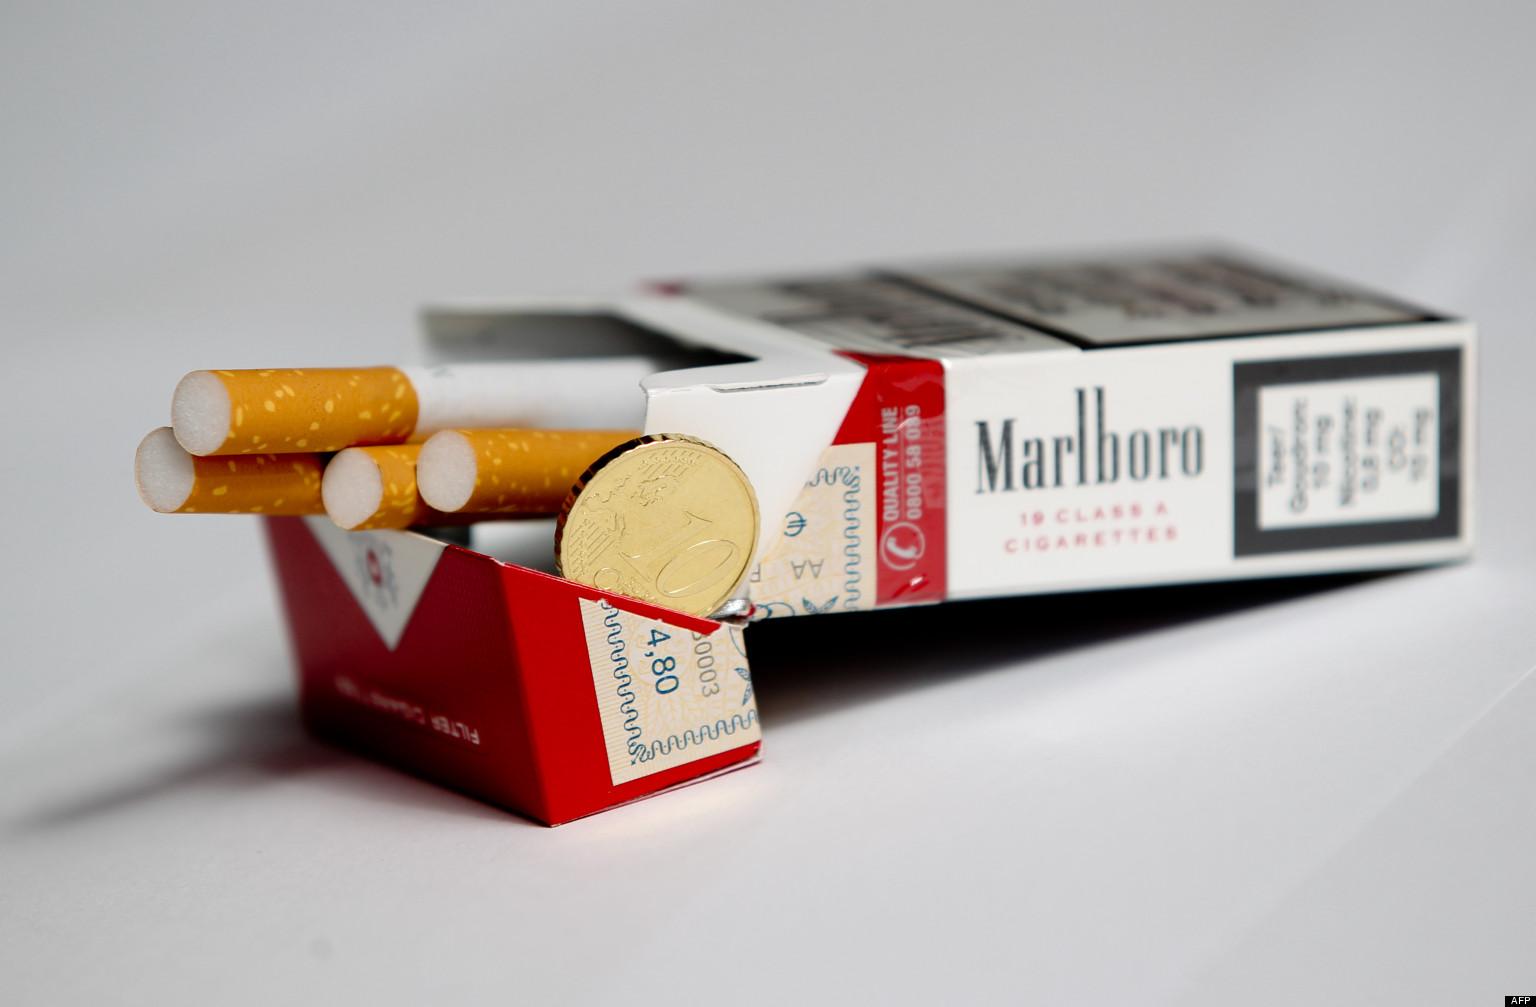 tabac l 39 volution du prix du paquet de cigarettes en france de 2000 2012. Black Bedroom Furniture Sets. Home Design Ideas